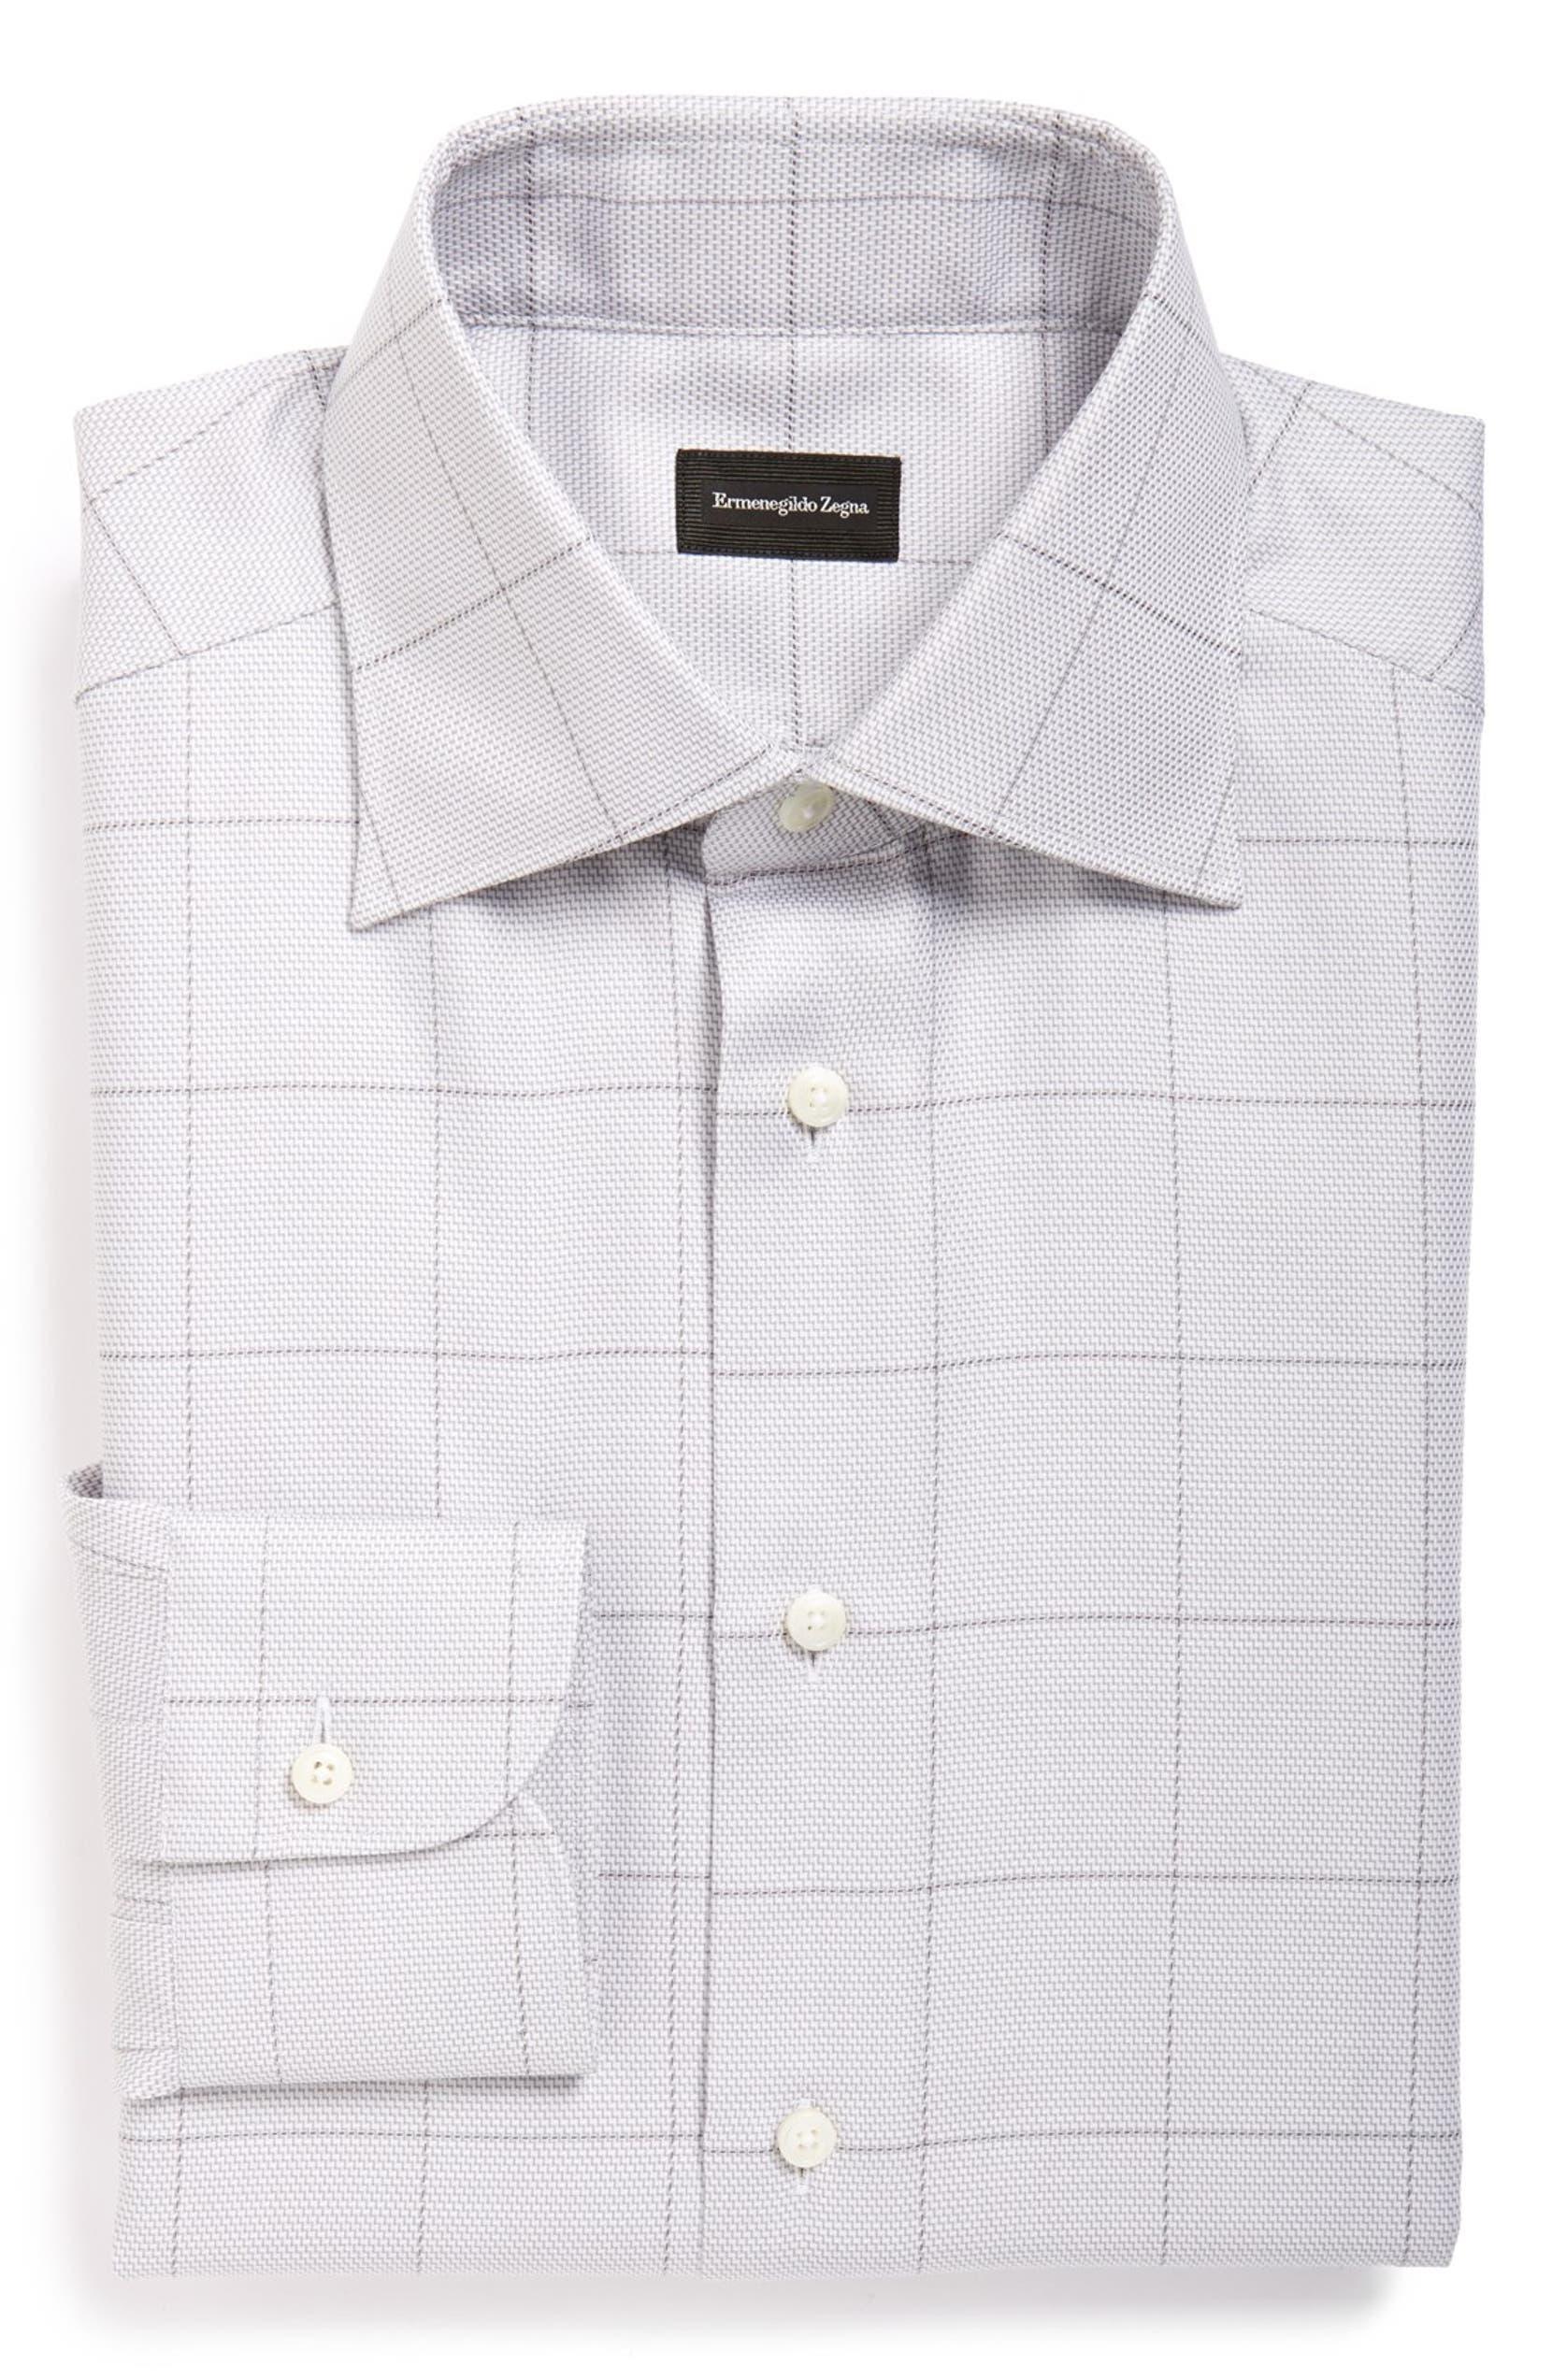 Ermenegildo Zegna Regular Fit Check Dress Shirt Nordstrom